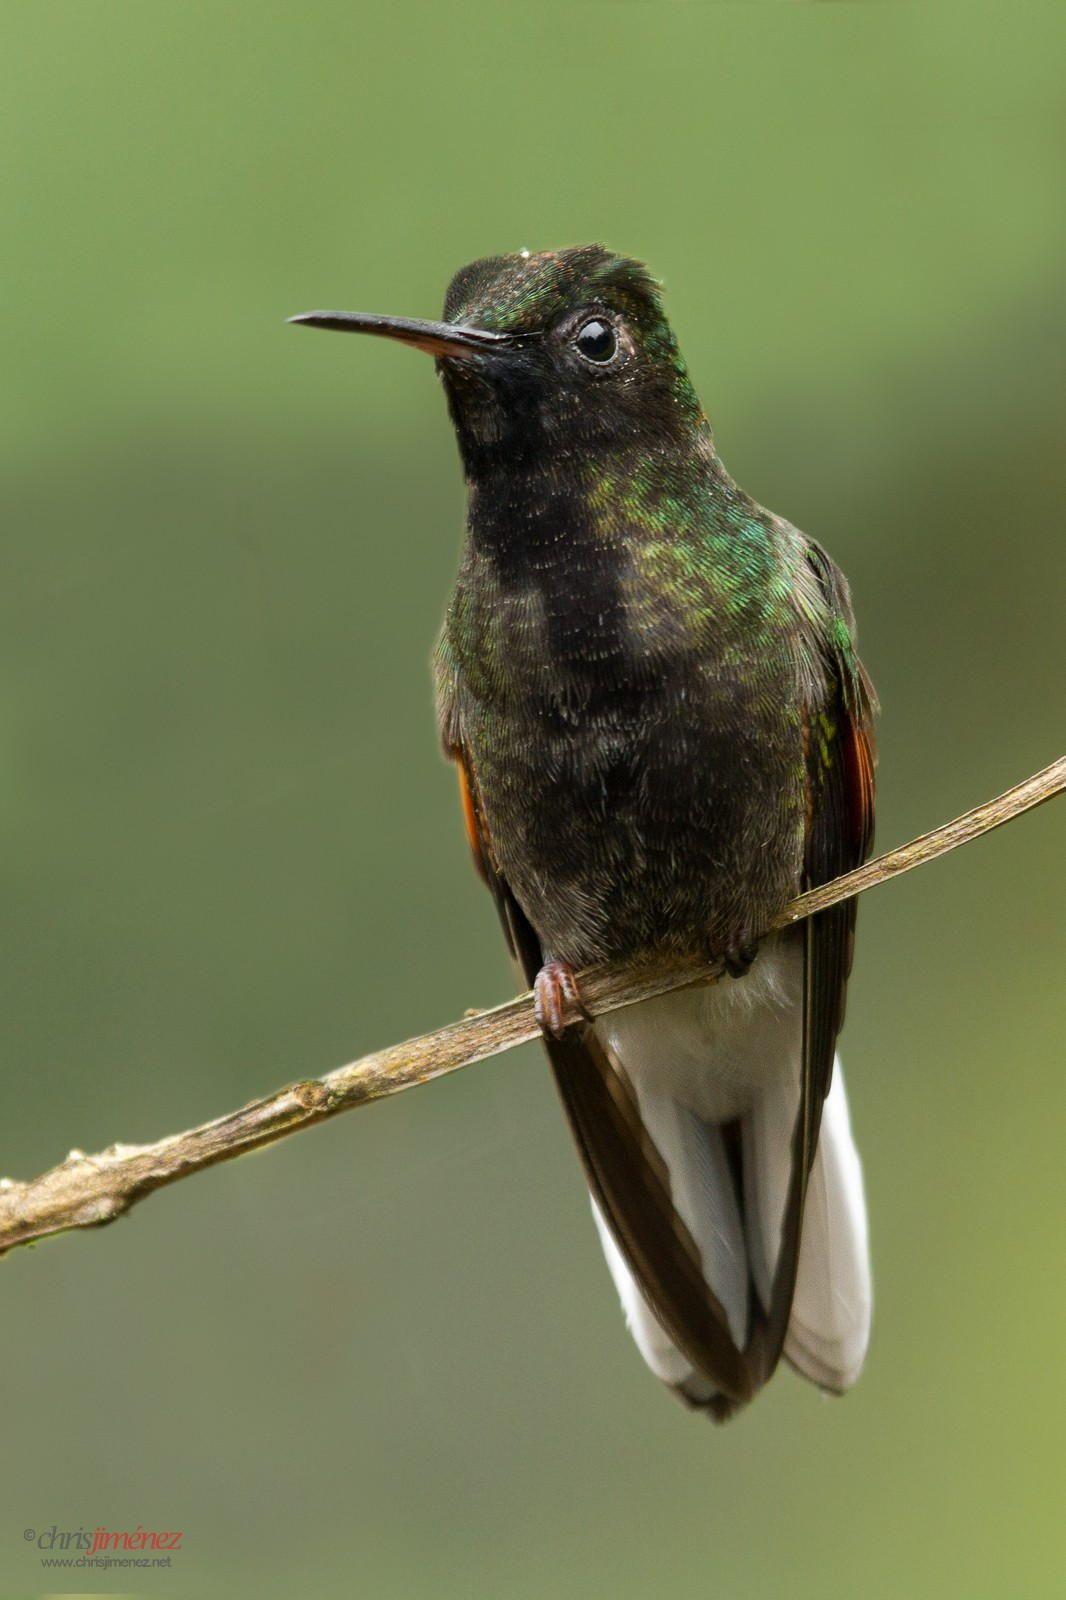 Blackbellied Hummingbird (Eupherusa nigriventris) perched